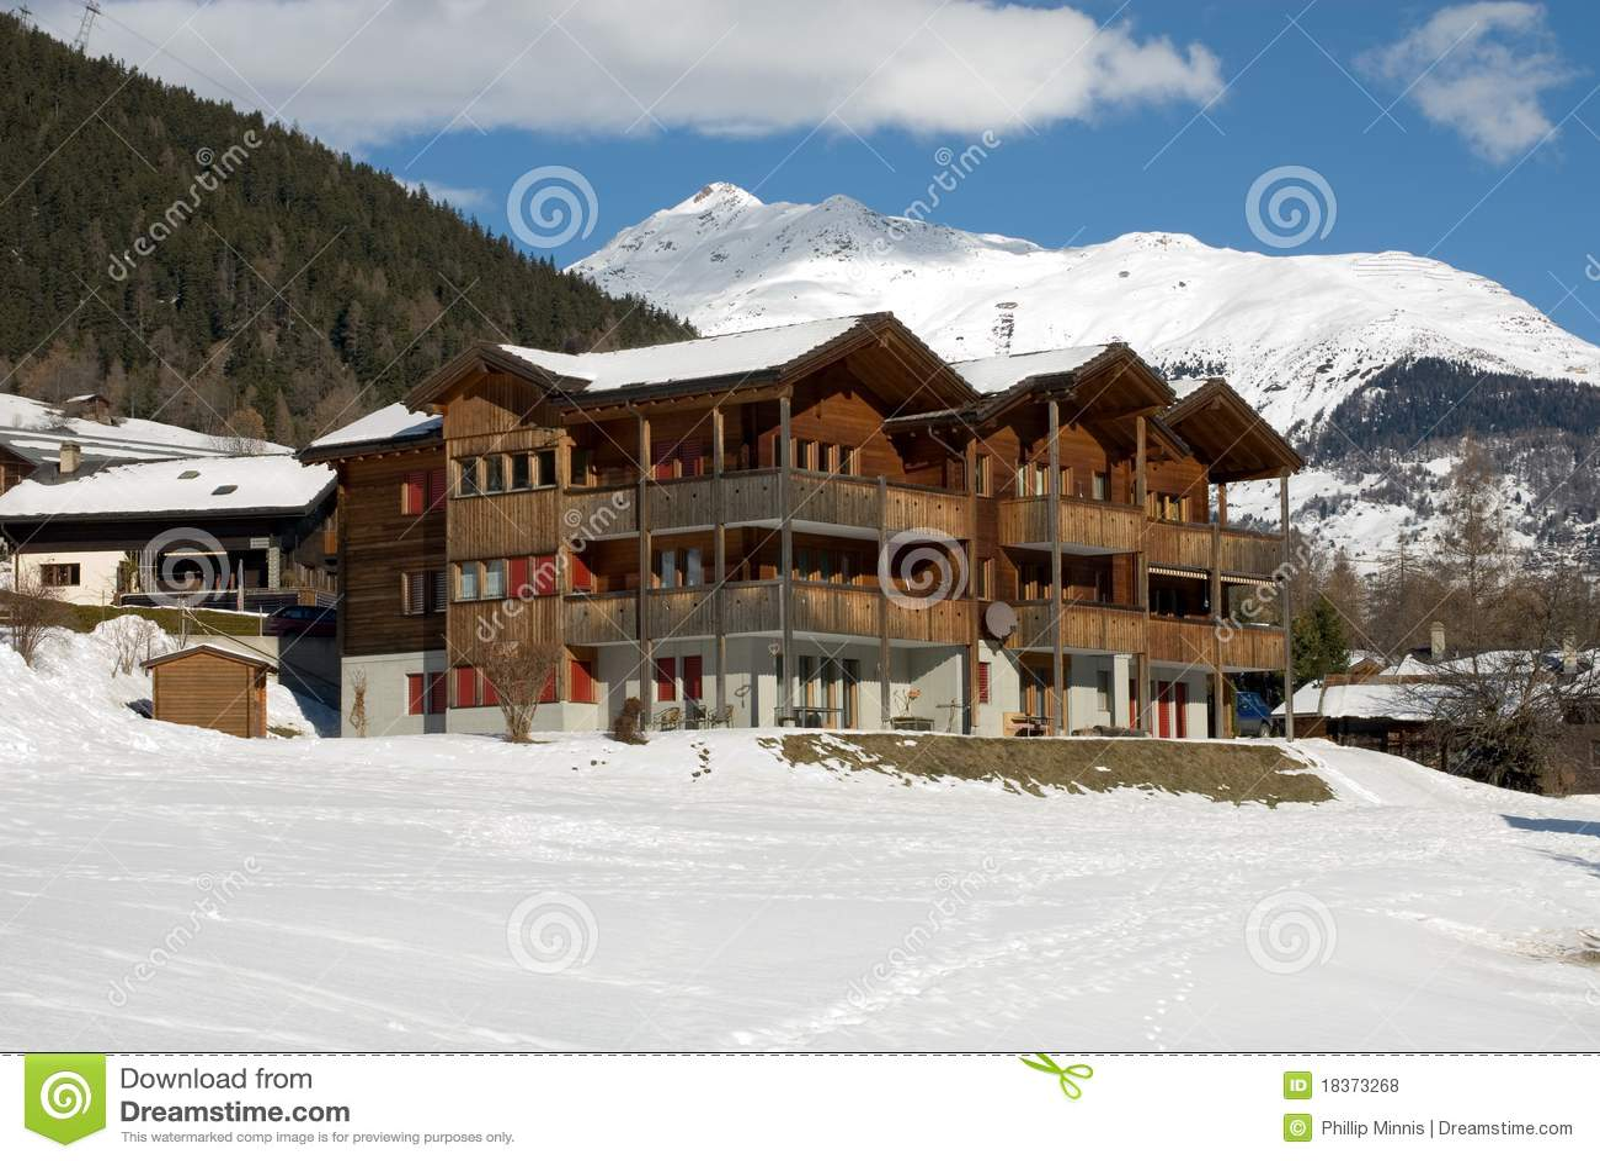 Alpine House Royalty Free Stock Photos Image 18373268